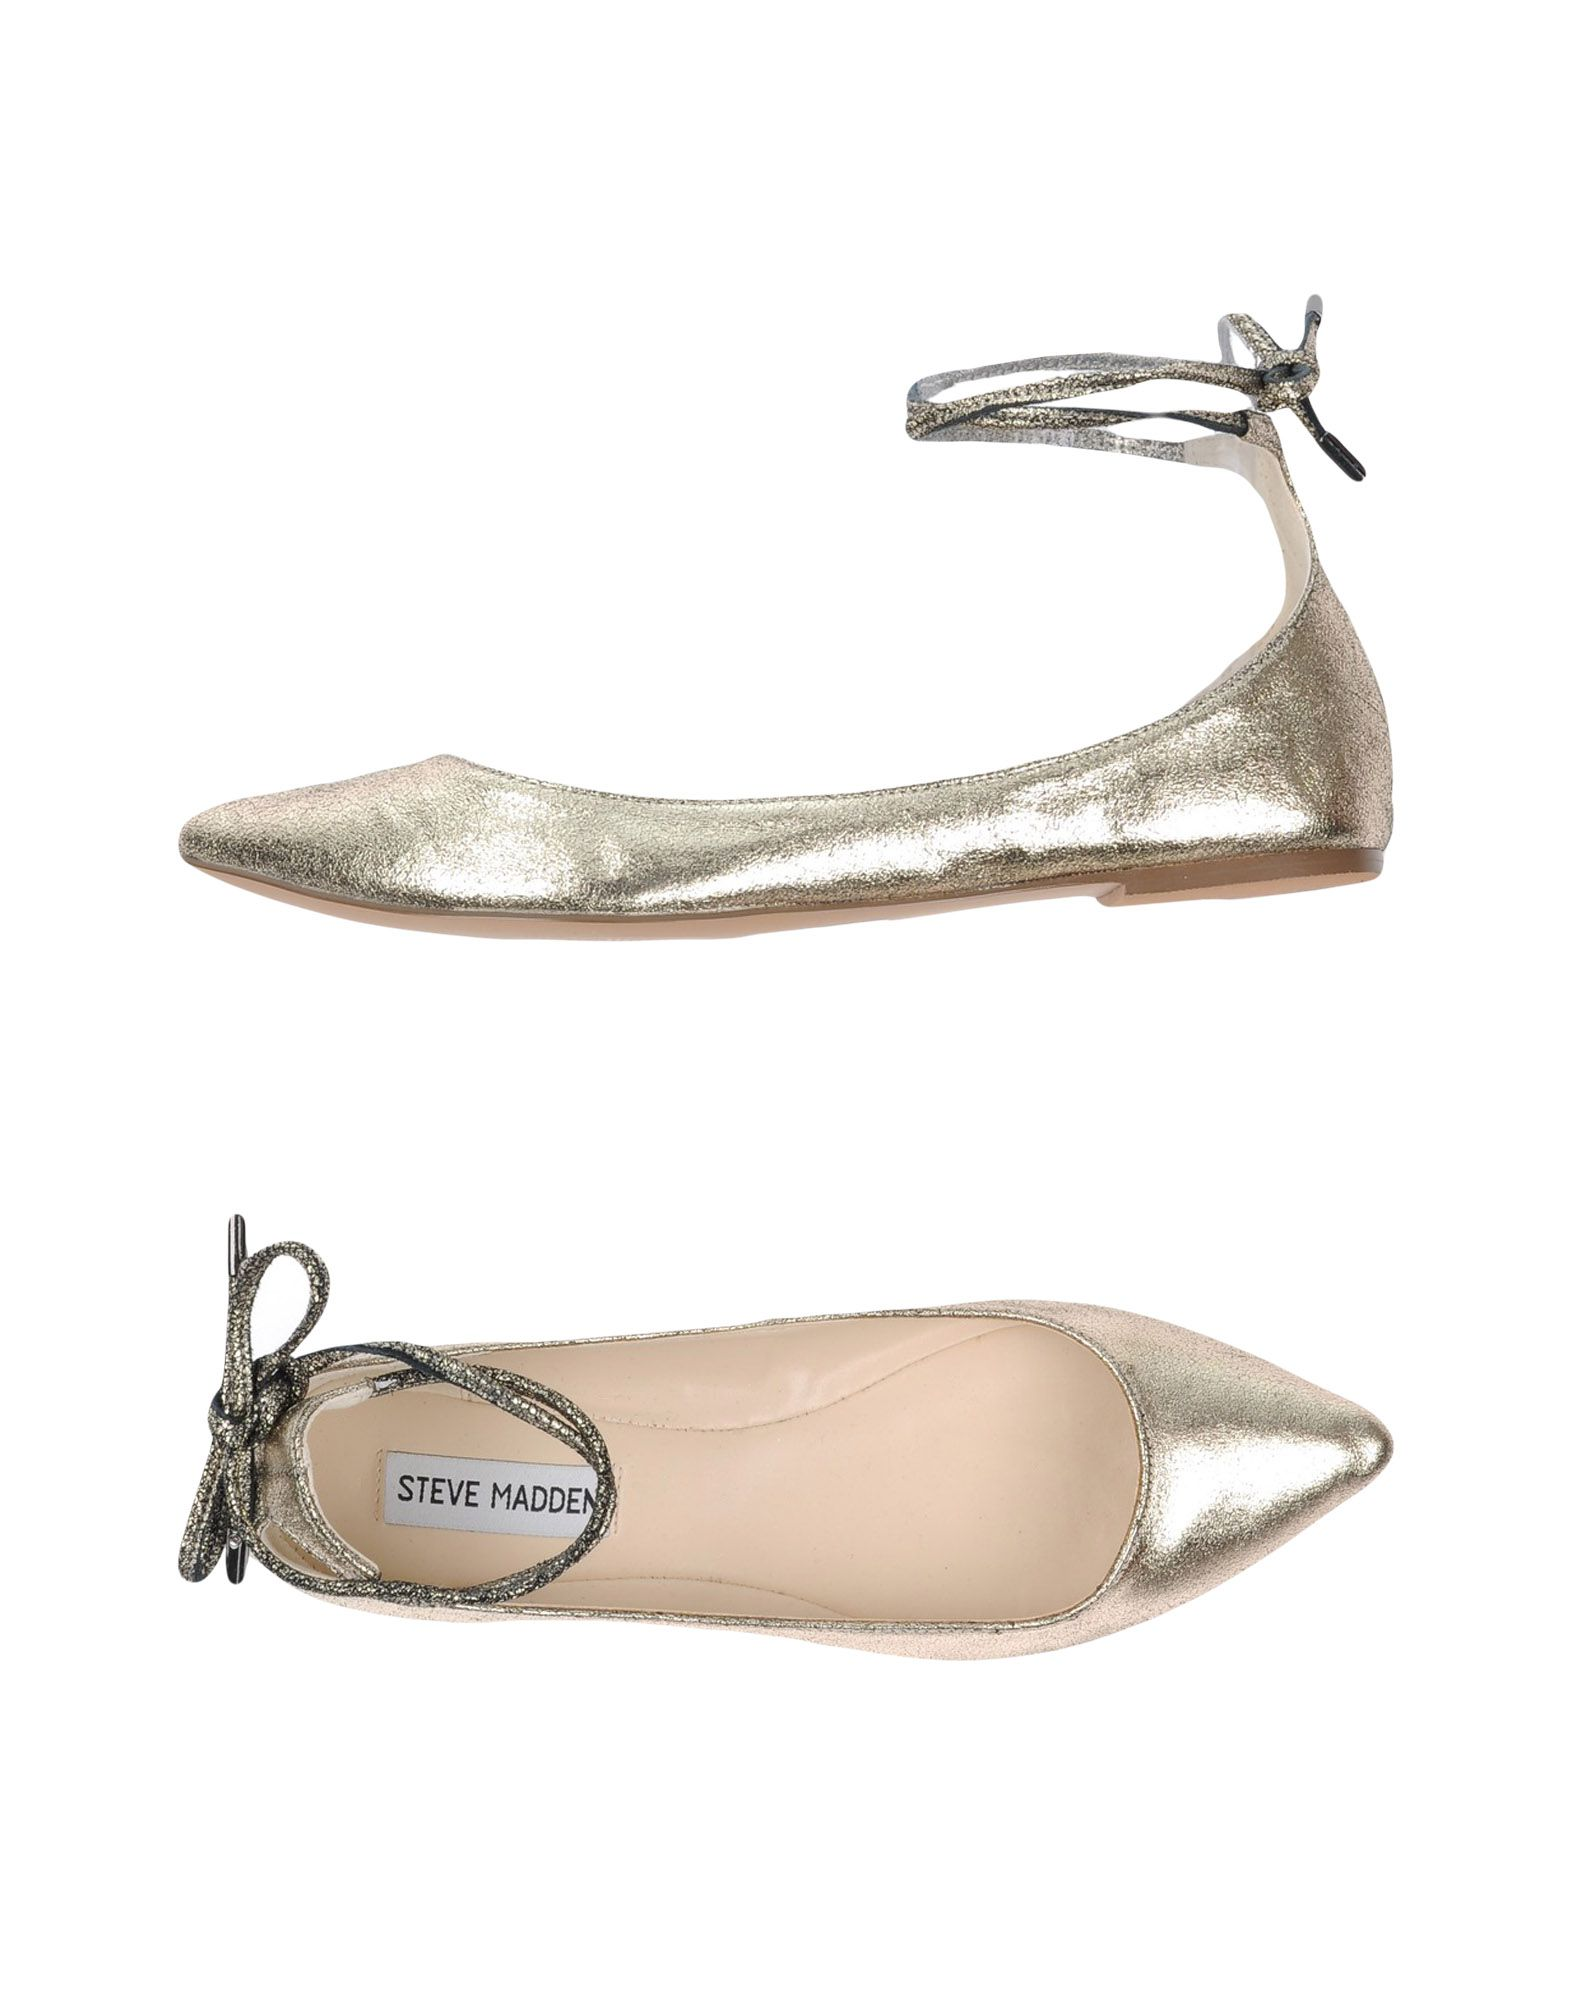 Steve Madden Ballerinas Damen  11318215RQ Gute Qualität beliebte Schuhe